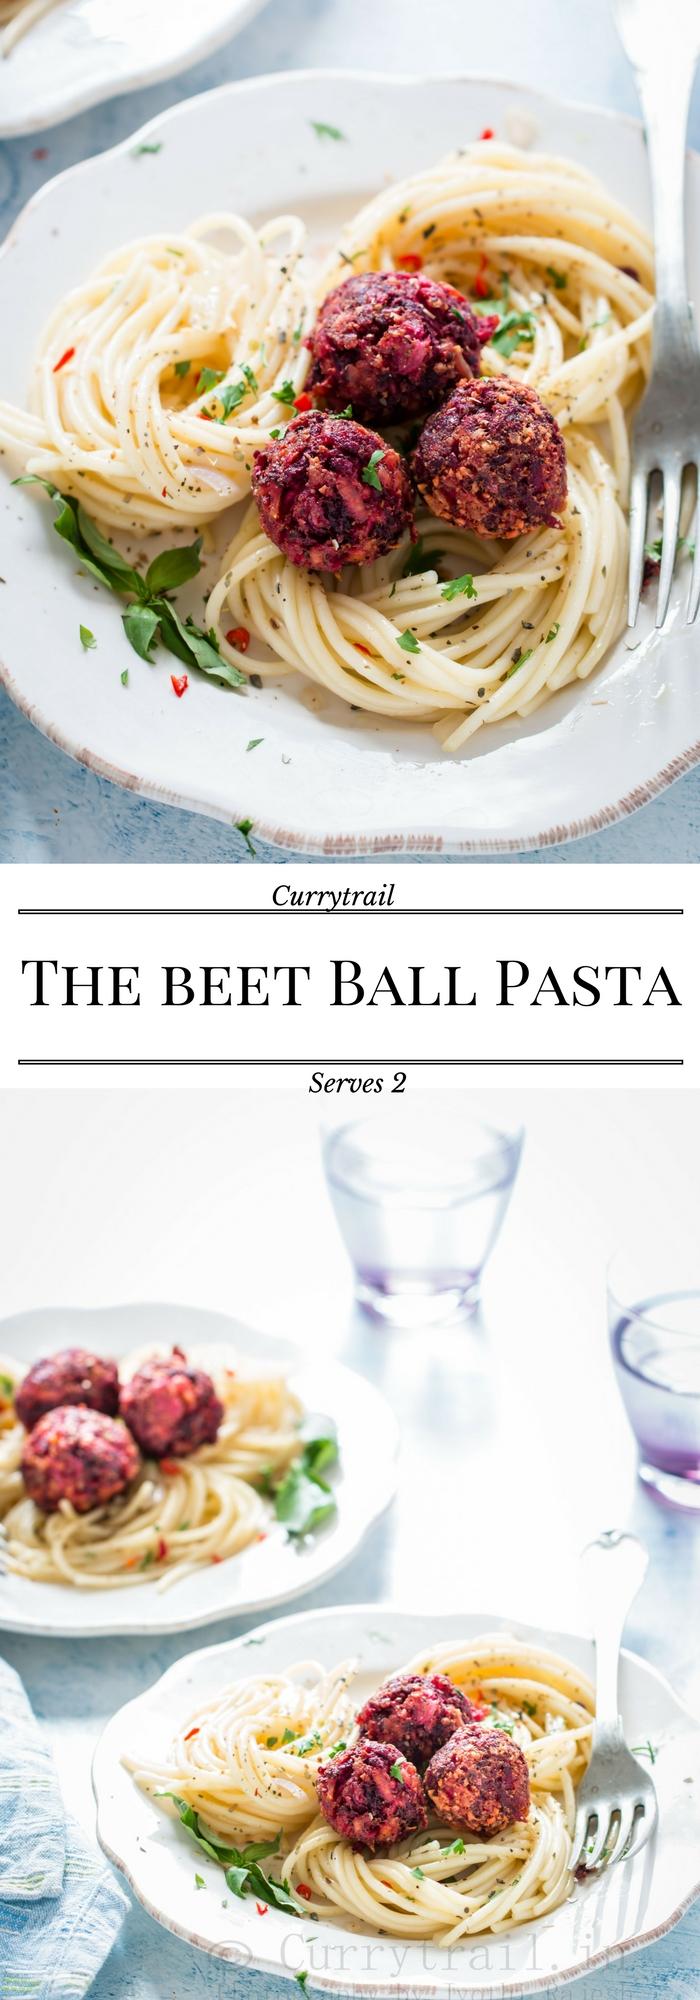 Beetball pasta